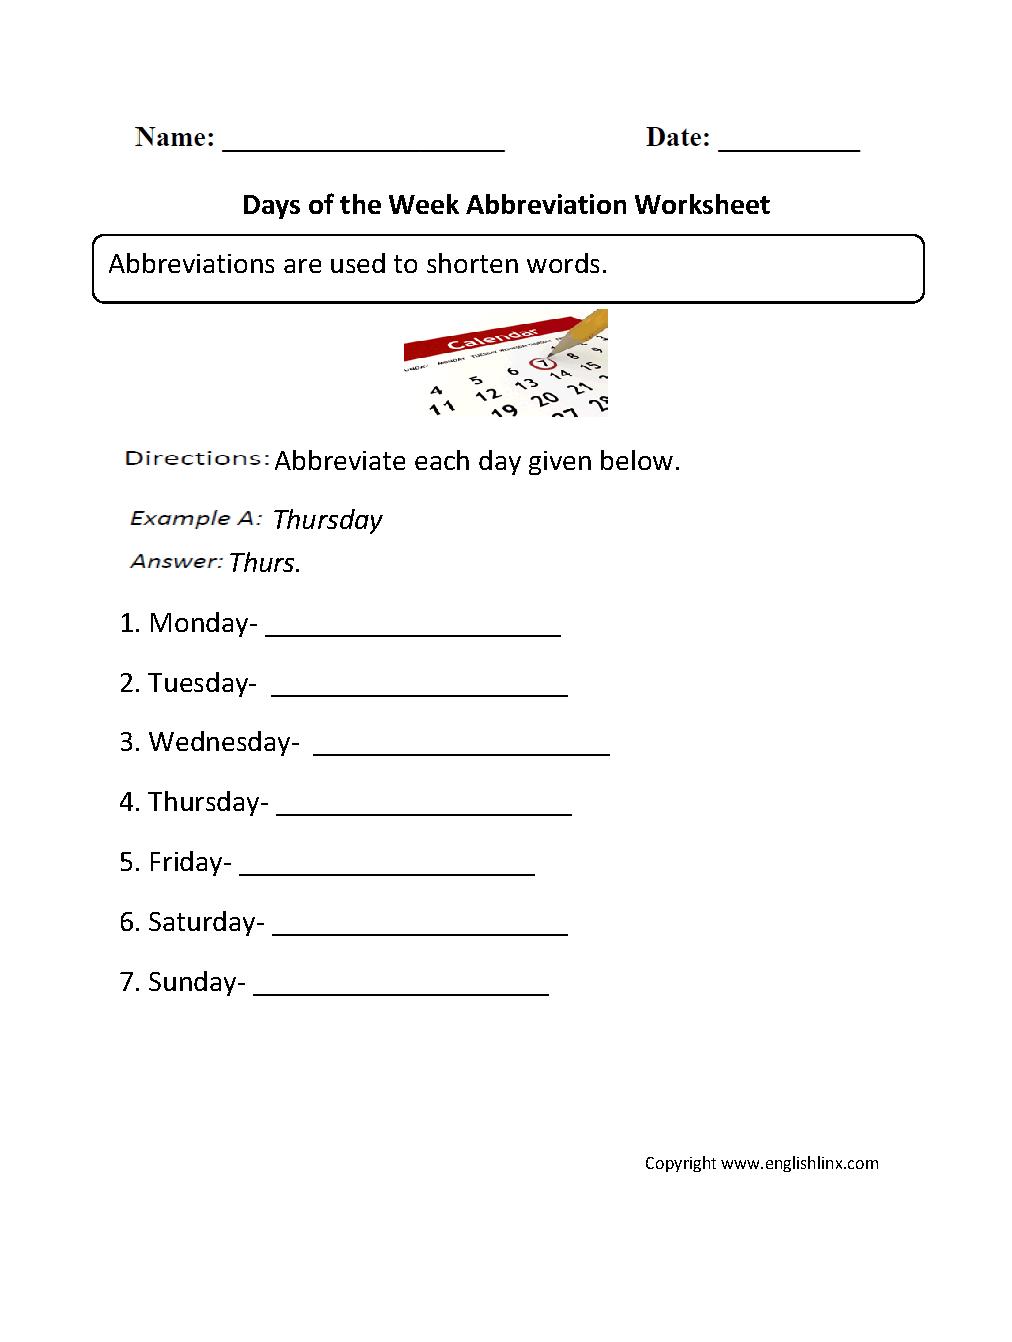 Grammar Mechanics Worksheets Abbreviation Worksheets